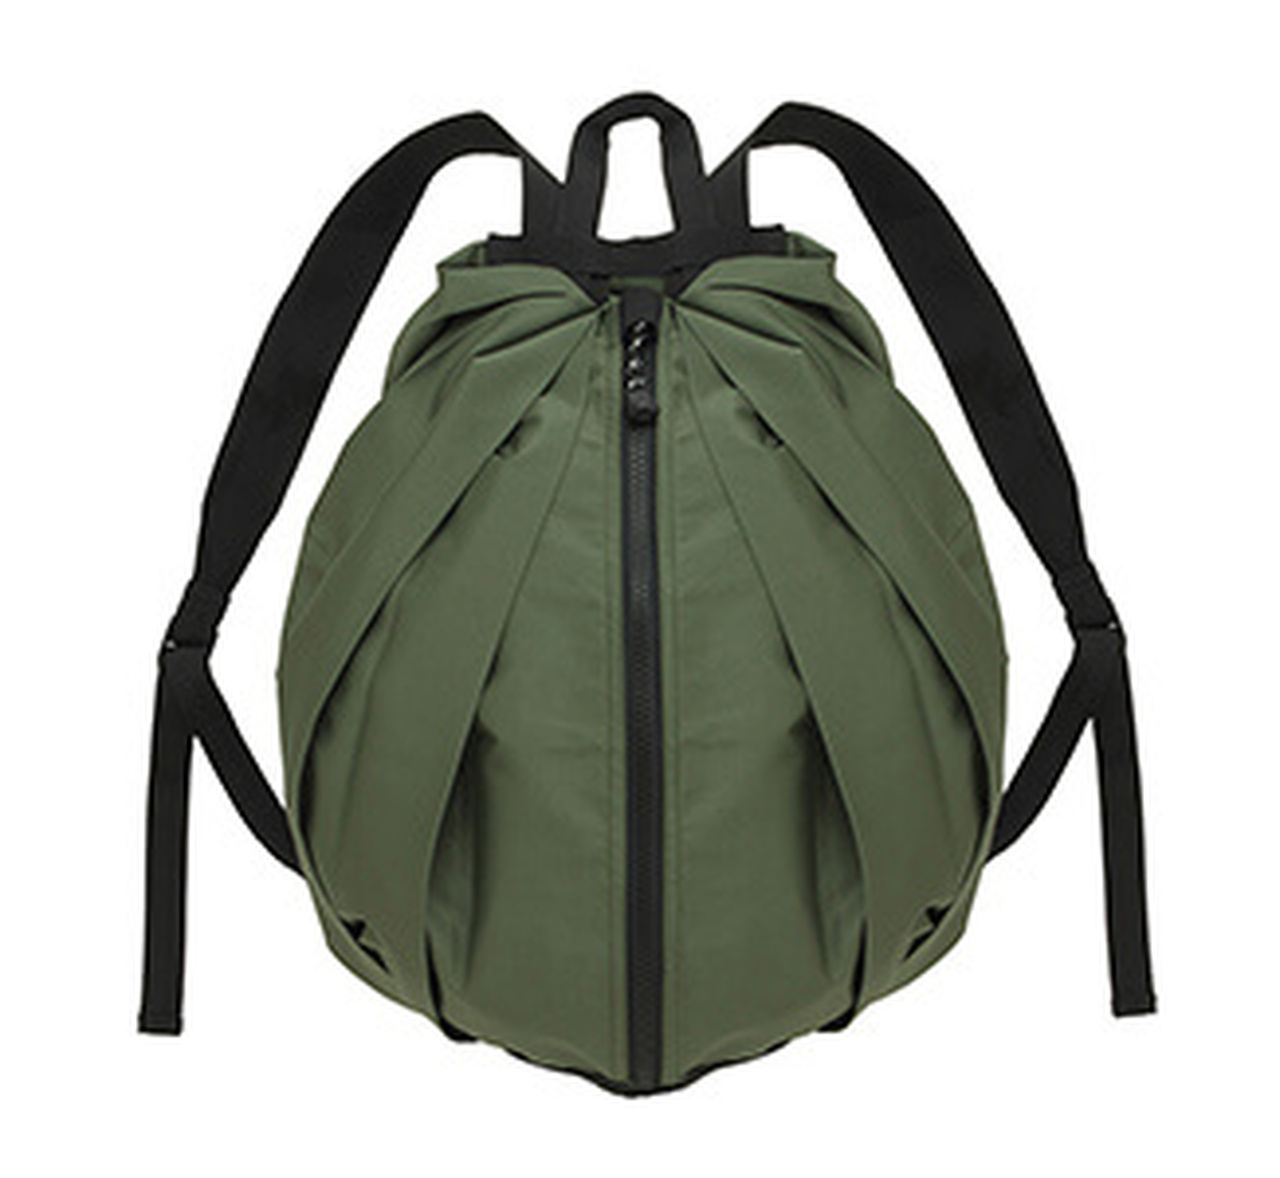 Marna Shupatto Rucksack Olive Складной рюкзак